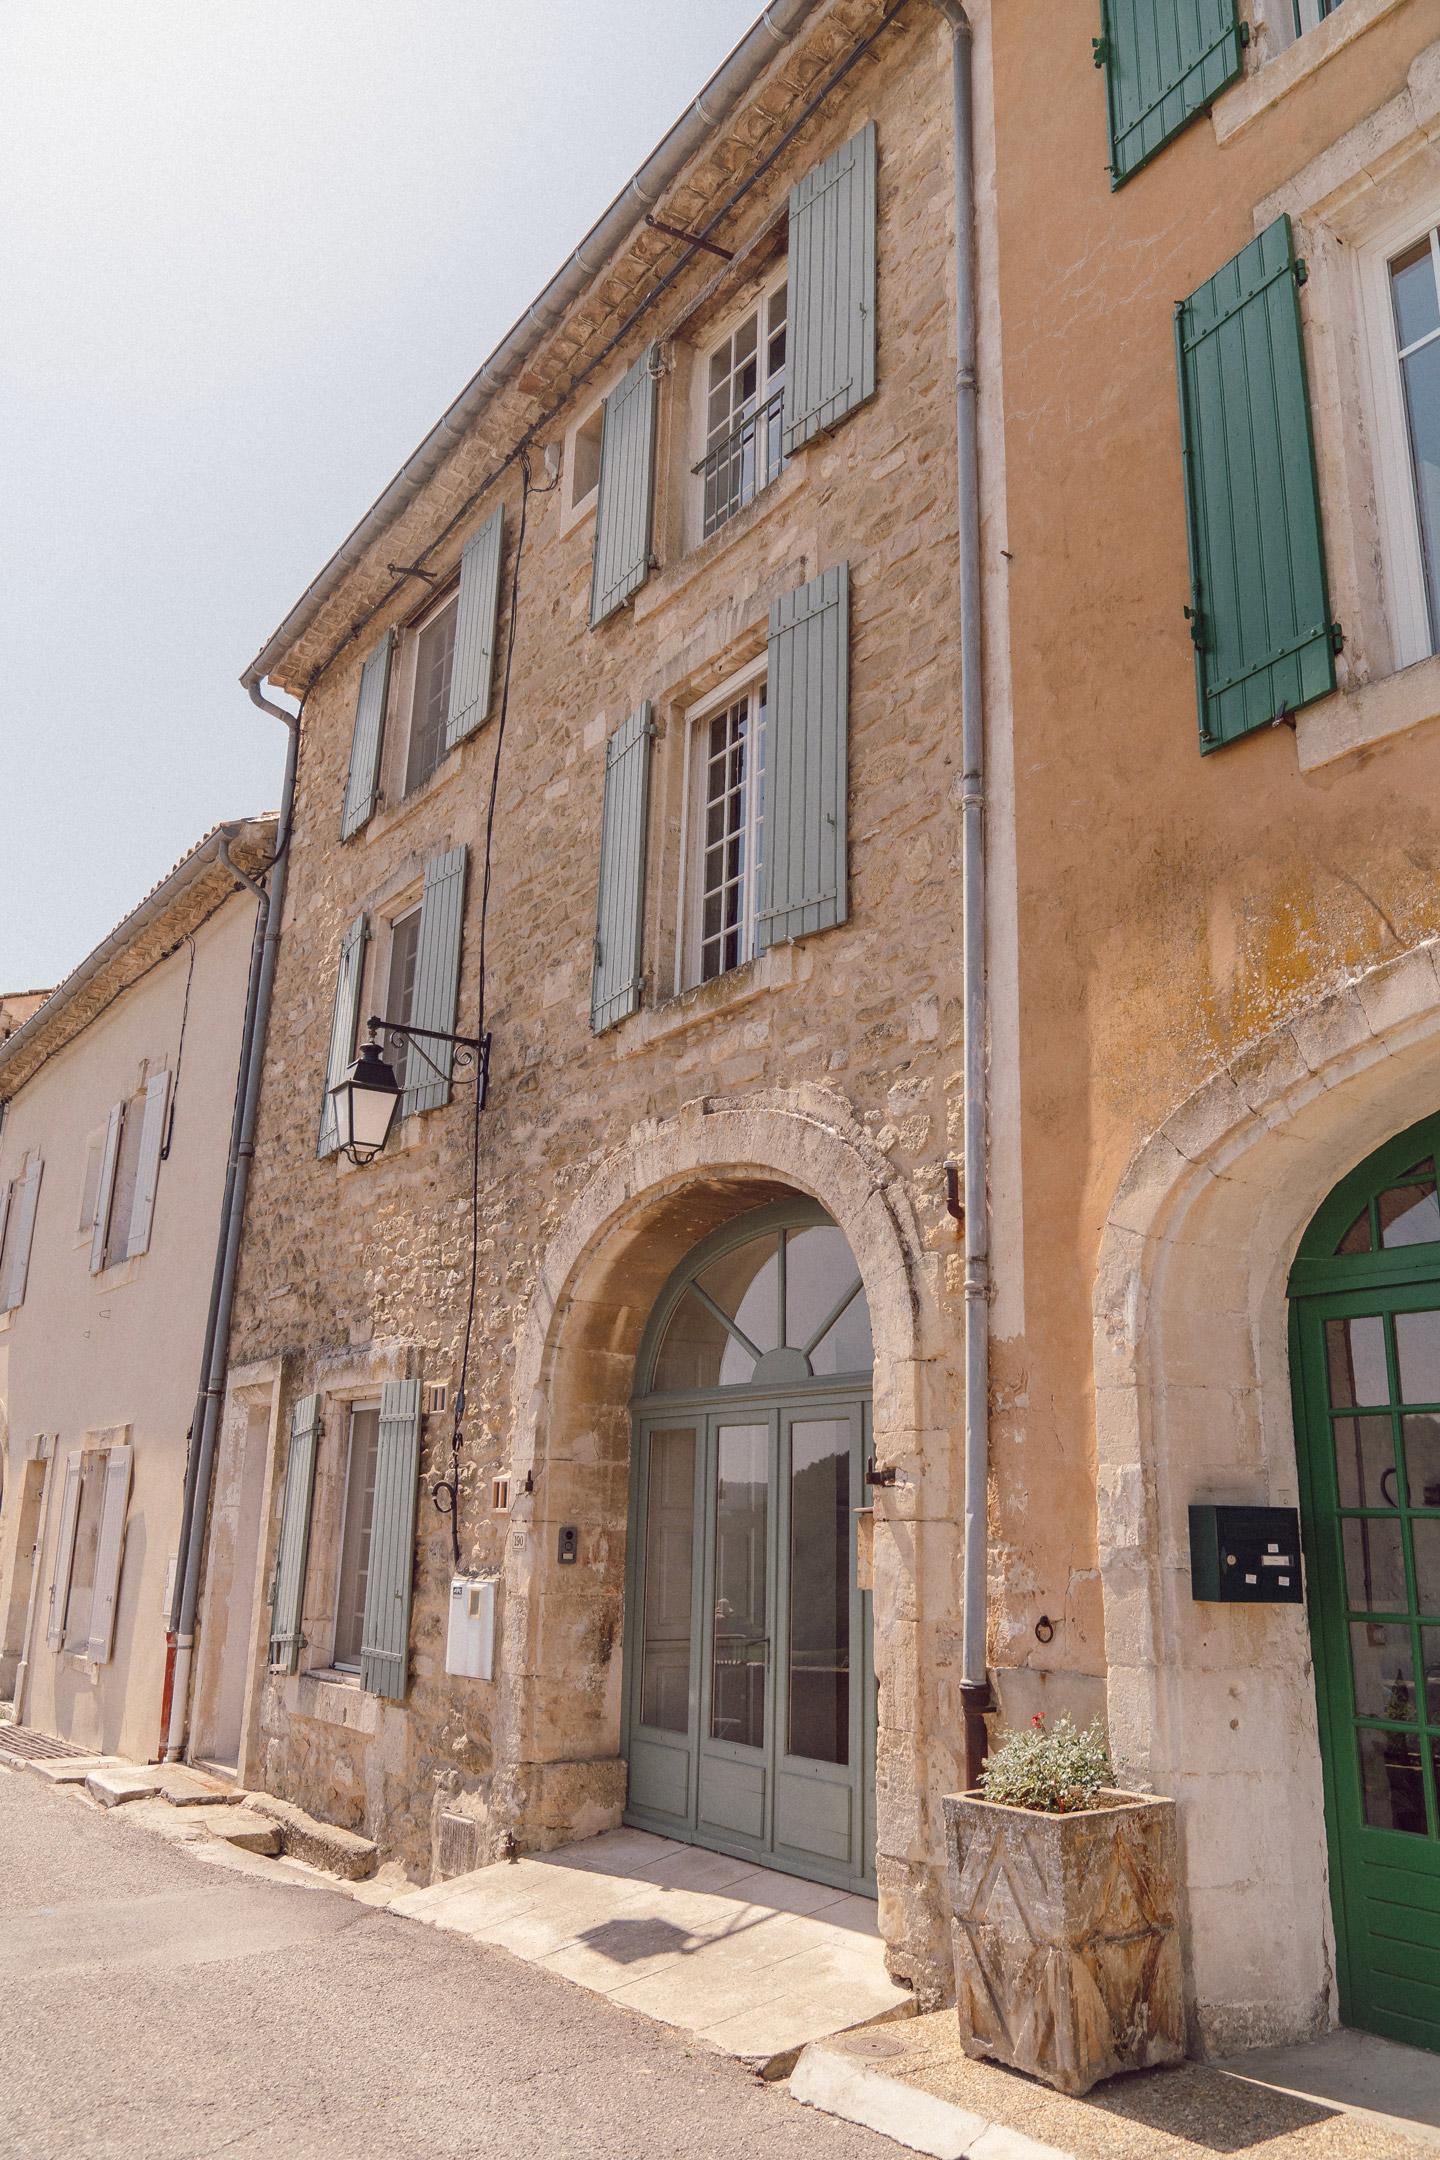 provence-menerbes-oppede-isle-sur-la-sorgue-17